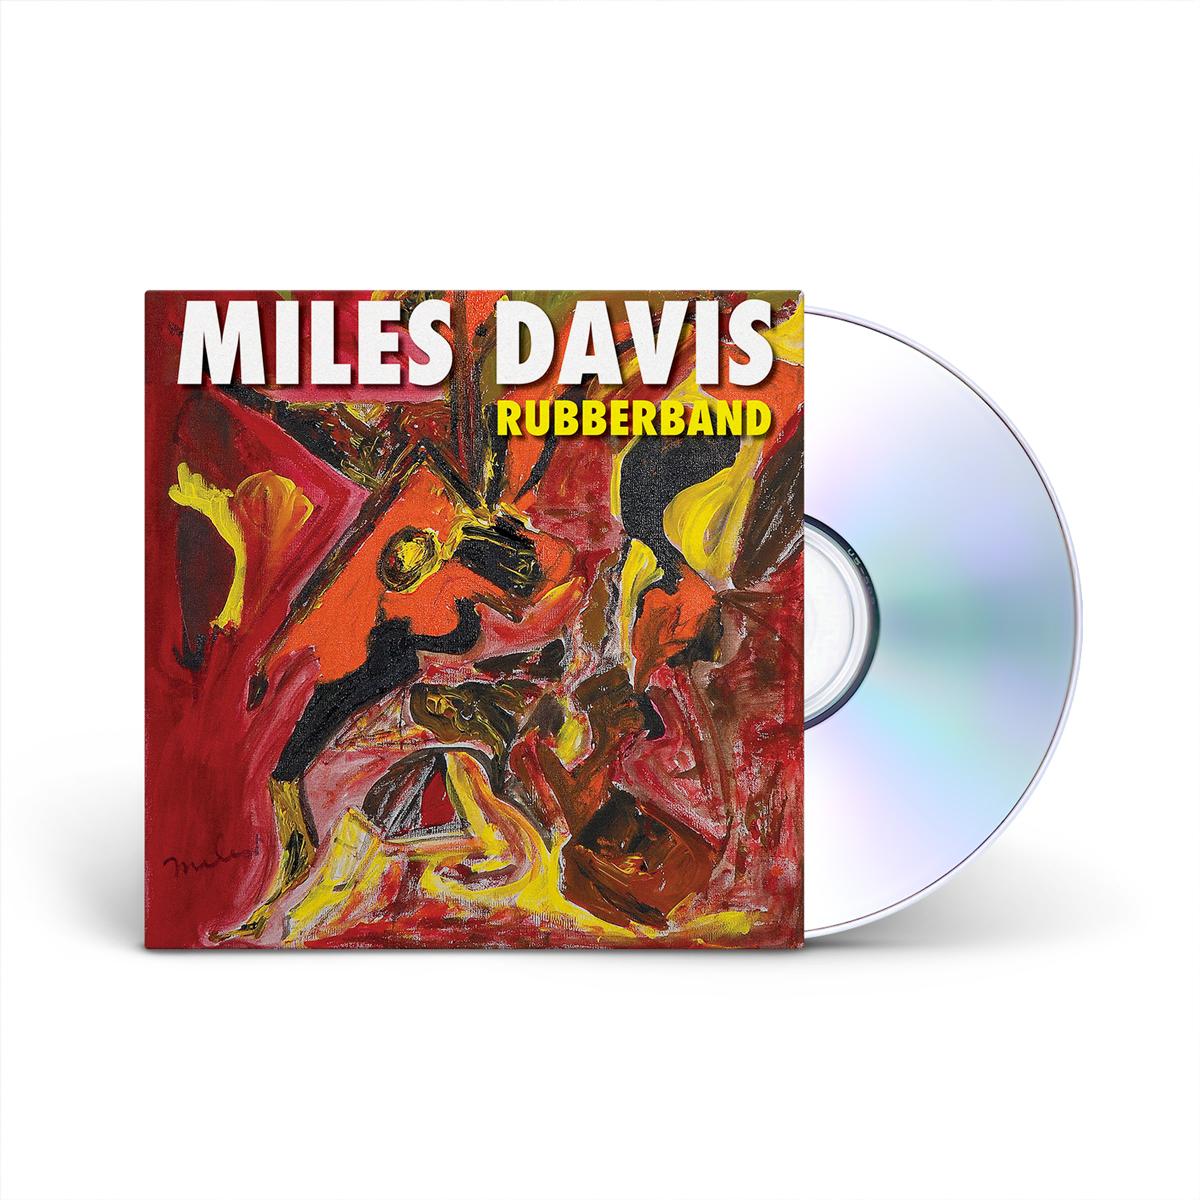 Miles Davis Rubberband CD